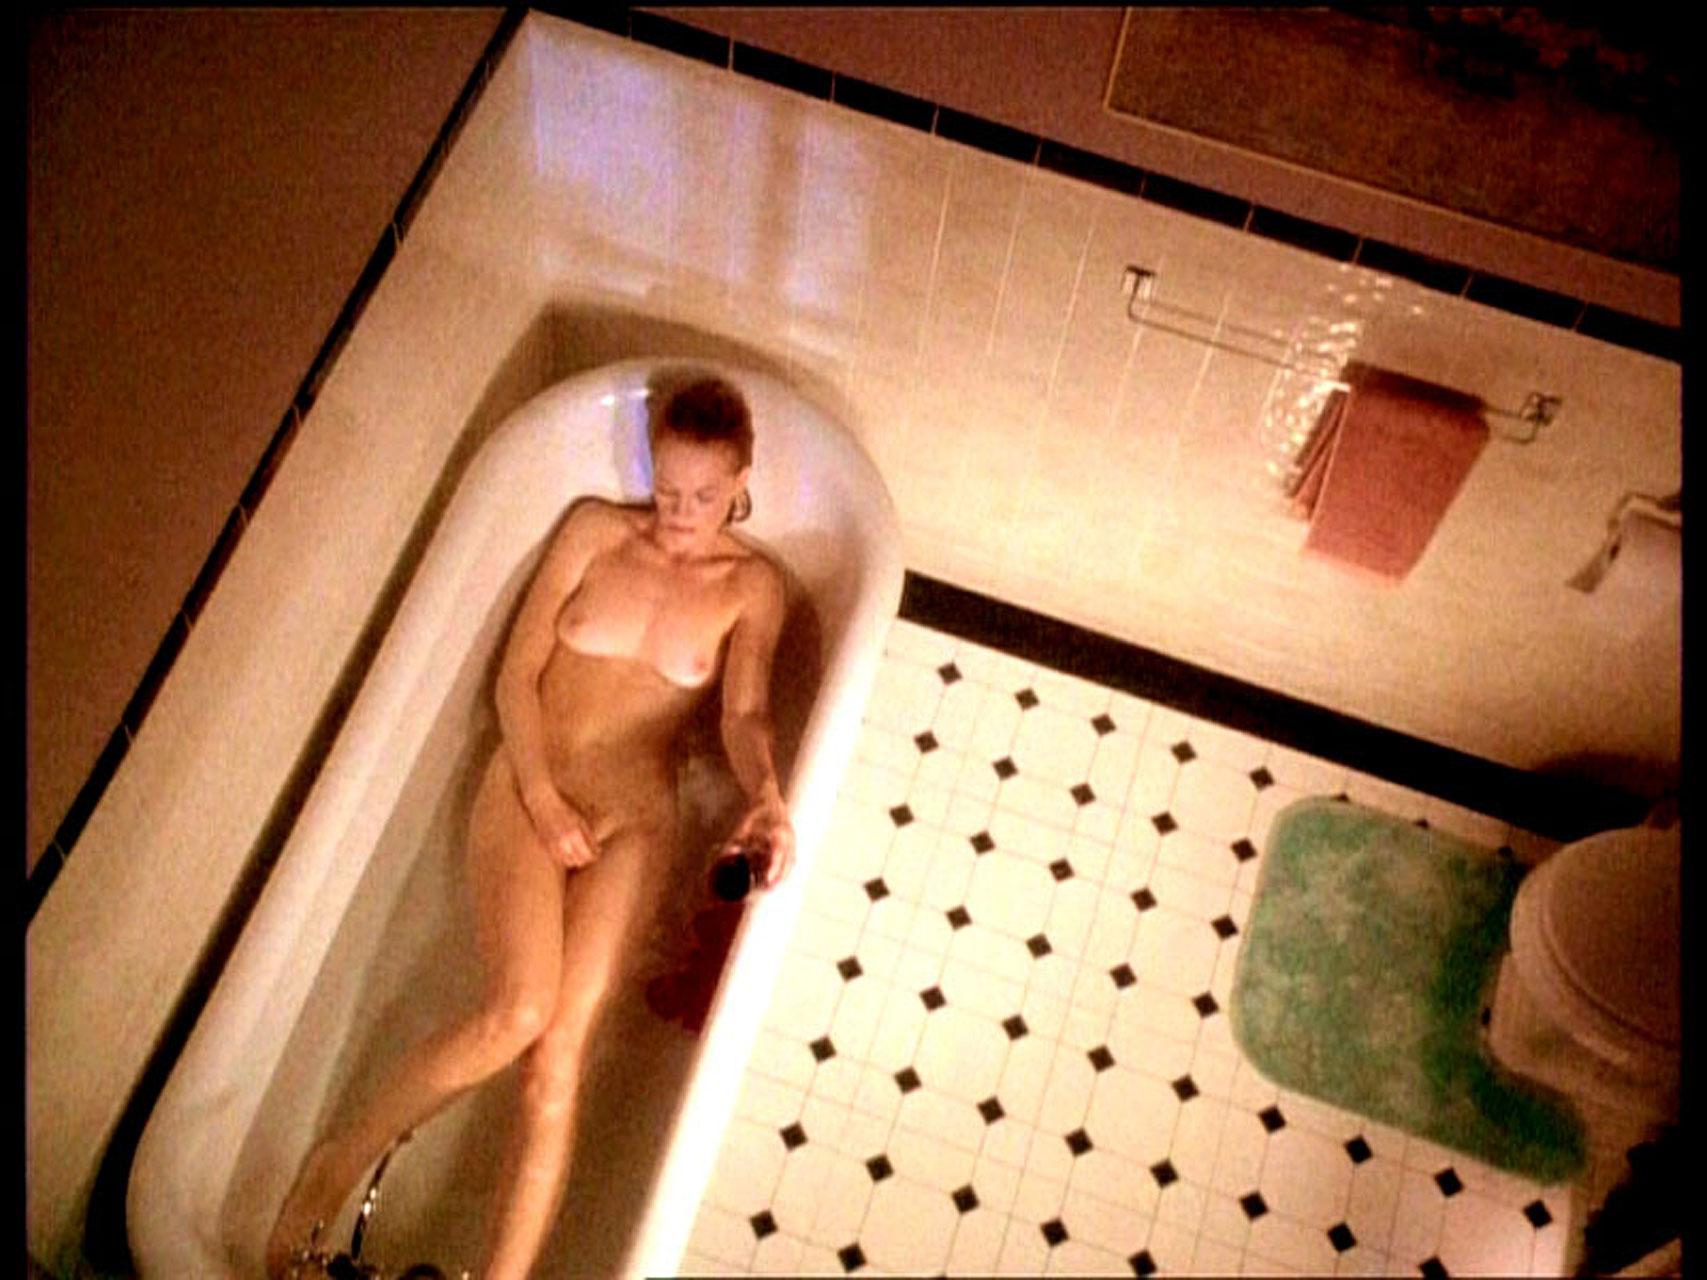 film porno gay gratis in der turnhalle videos porn free Rocco Siffredi